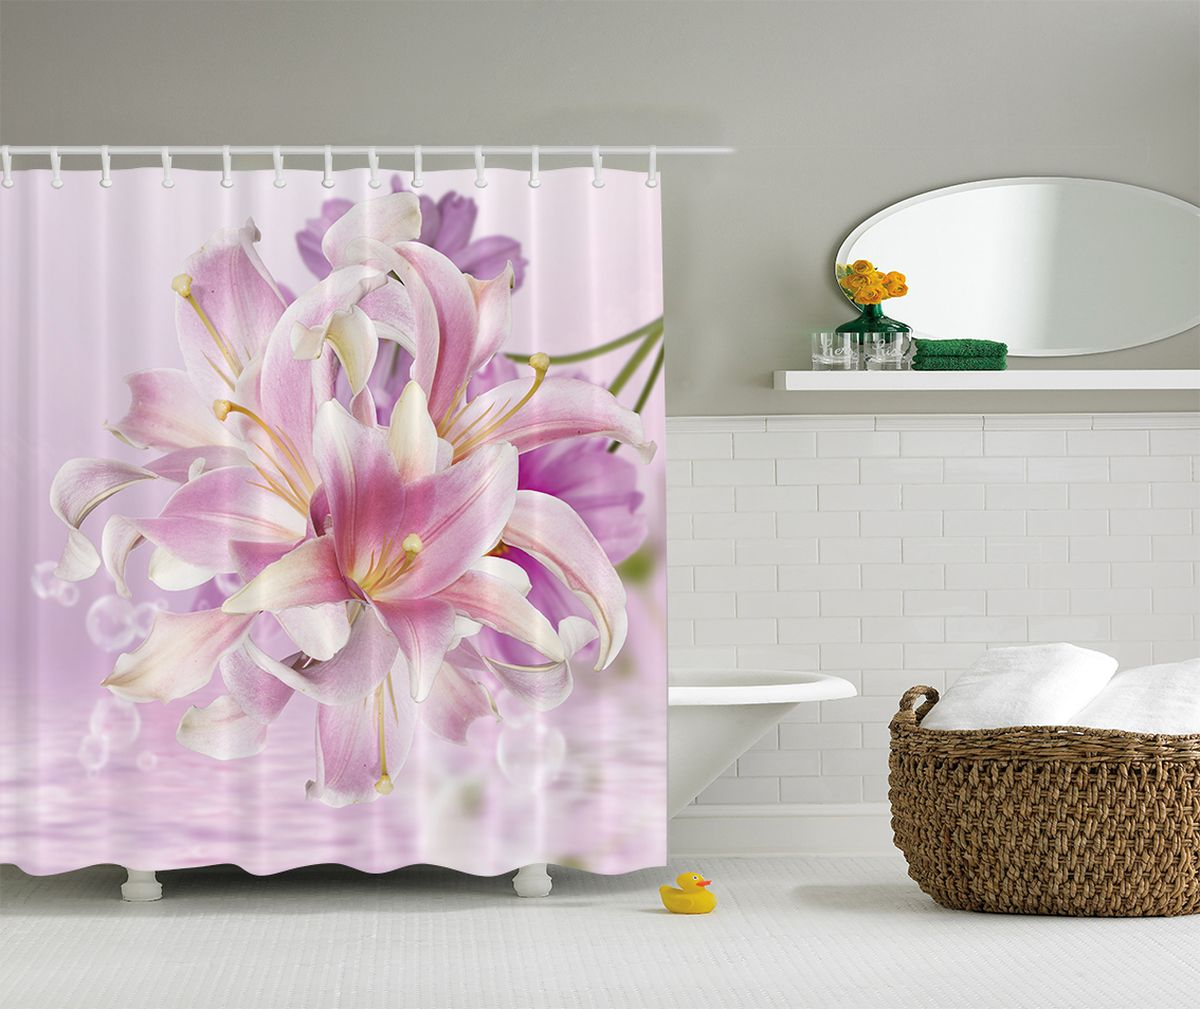 Штора для ванной комнаты Magic Lady Душистый, 180 х 200 см штора для ванной комнаты magic lady абрикос на закате весна 180 х 200 см